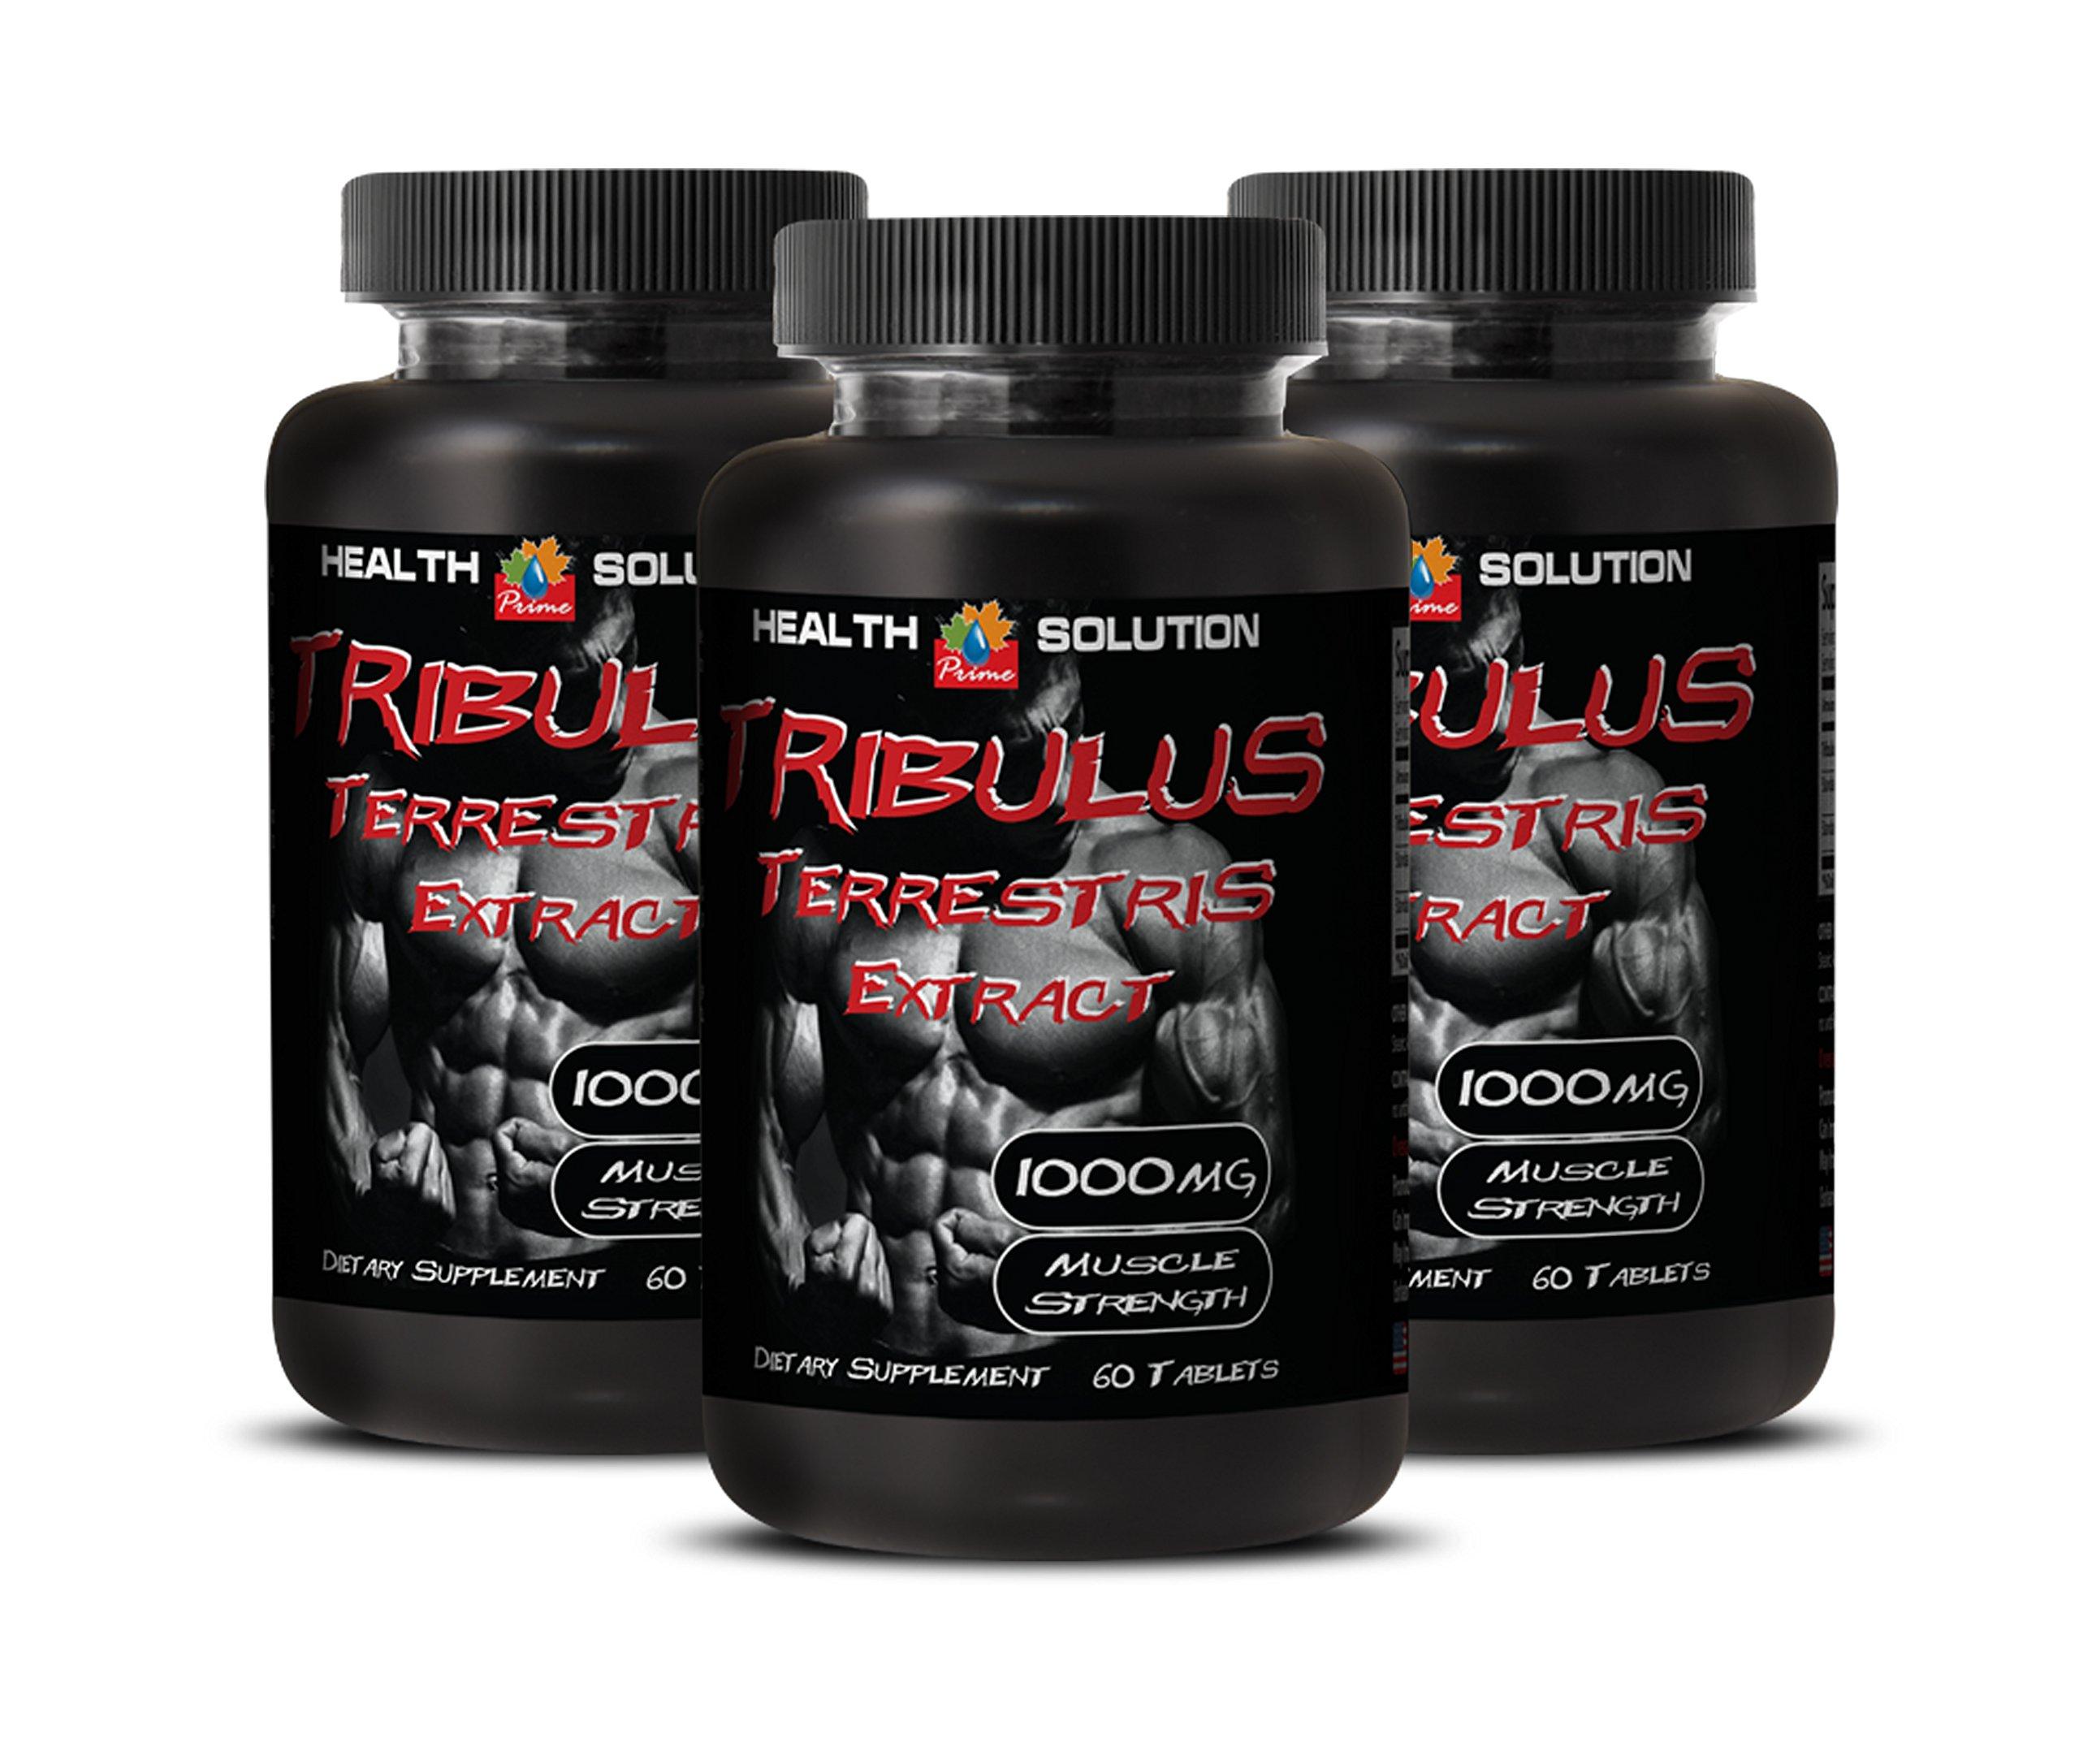 Testosterone booster vitamins - MUSCLE STRENGTH - TRIBULUS TERRESTRIS EXTRACT 1000mg - Tribulus 1000 - 3 Bottles 180 Tablets